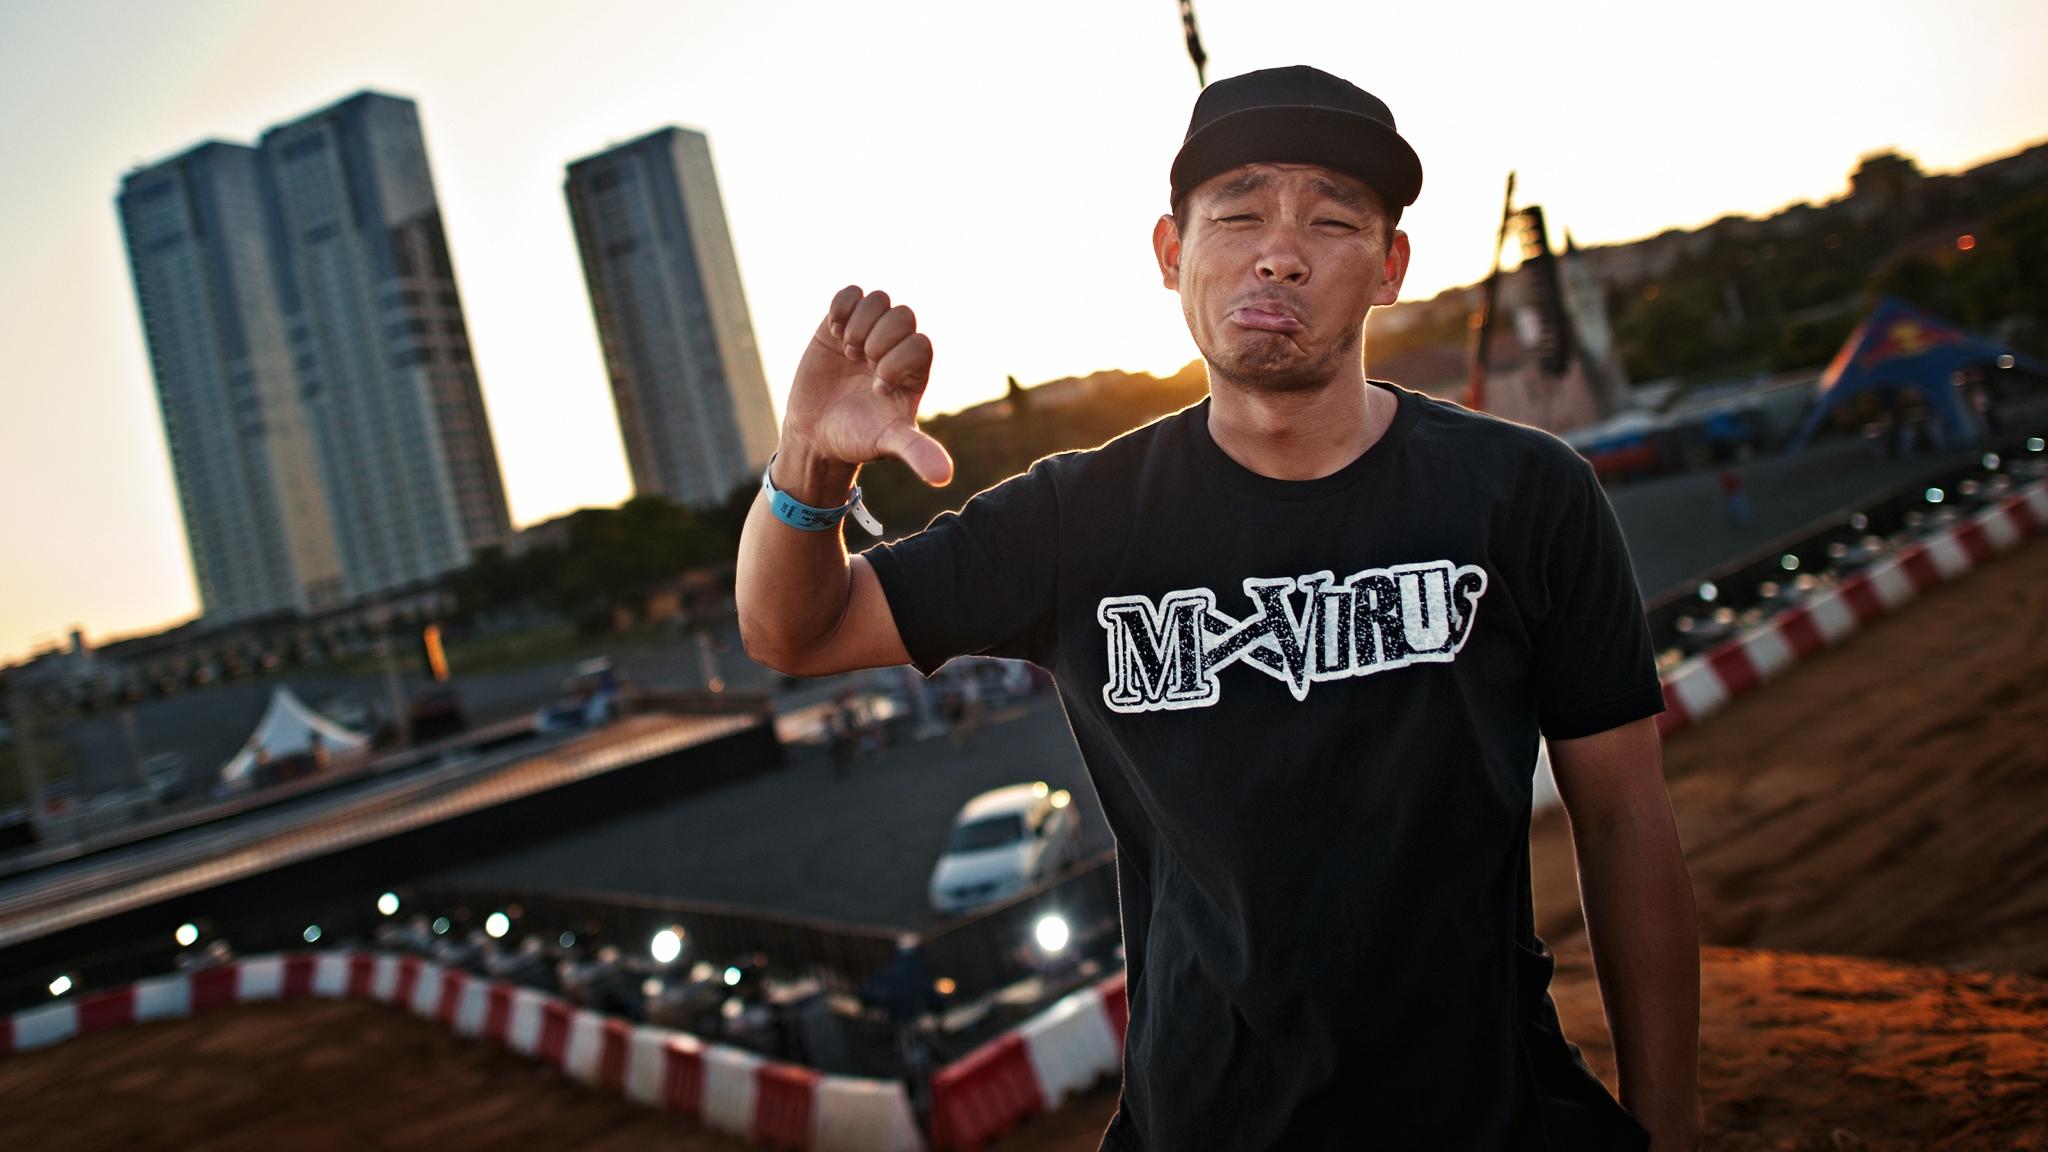 Eigo Sato